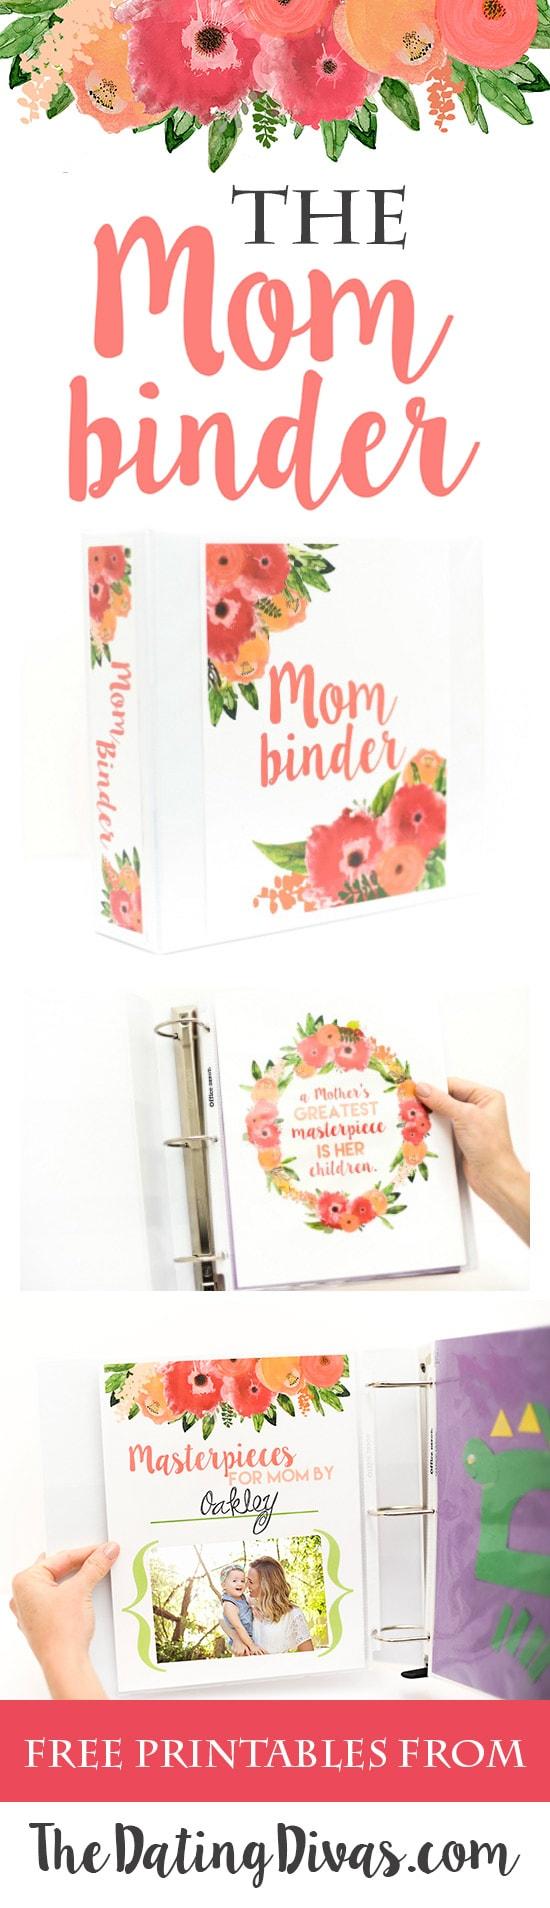 The Mom Binder